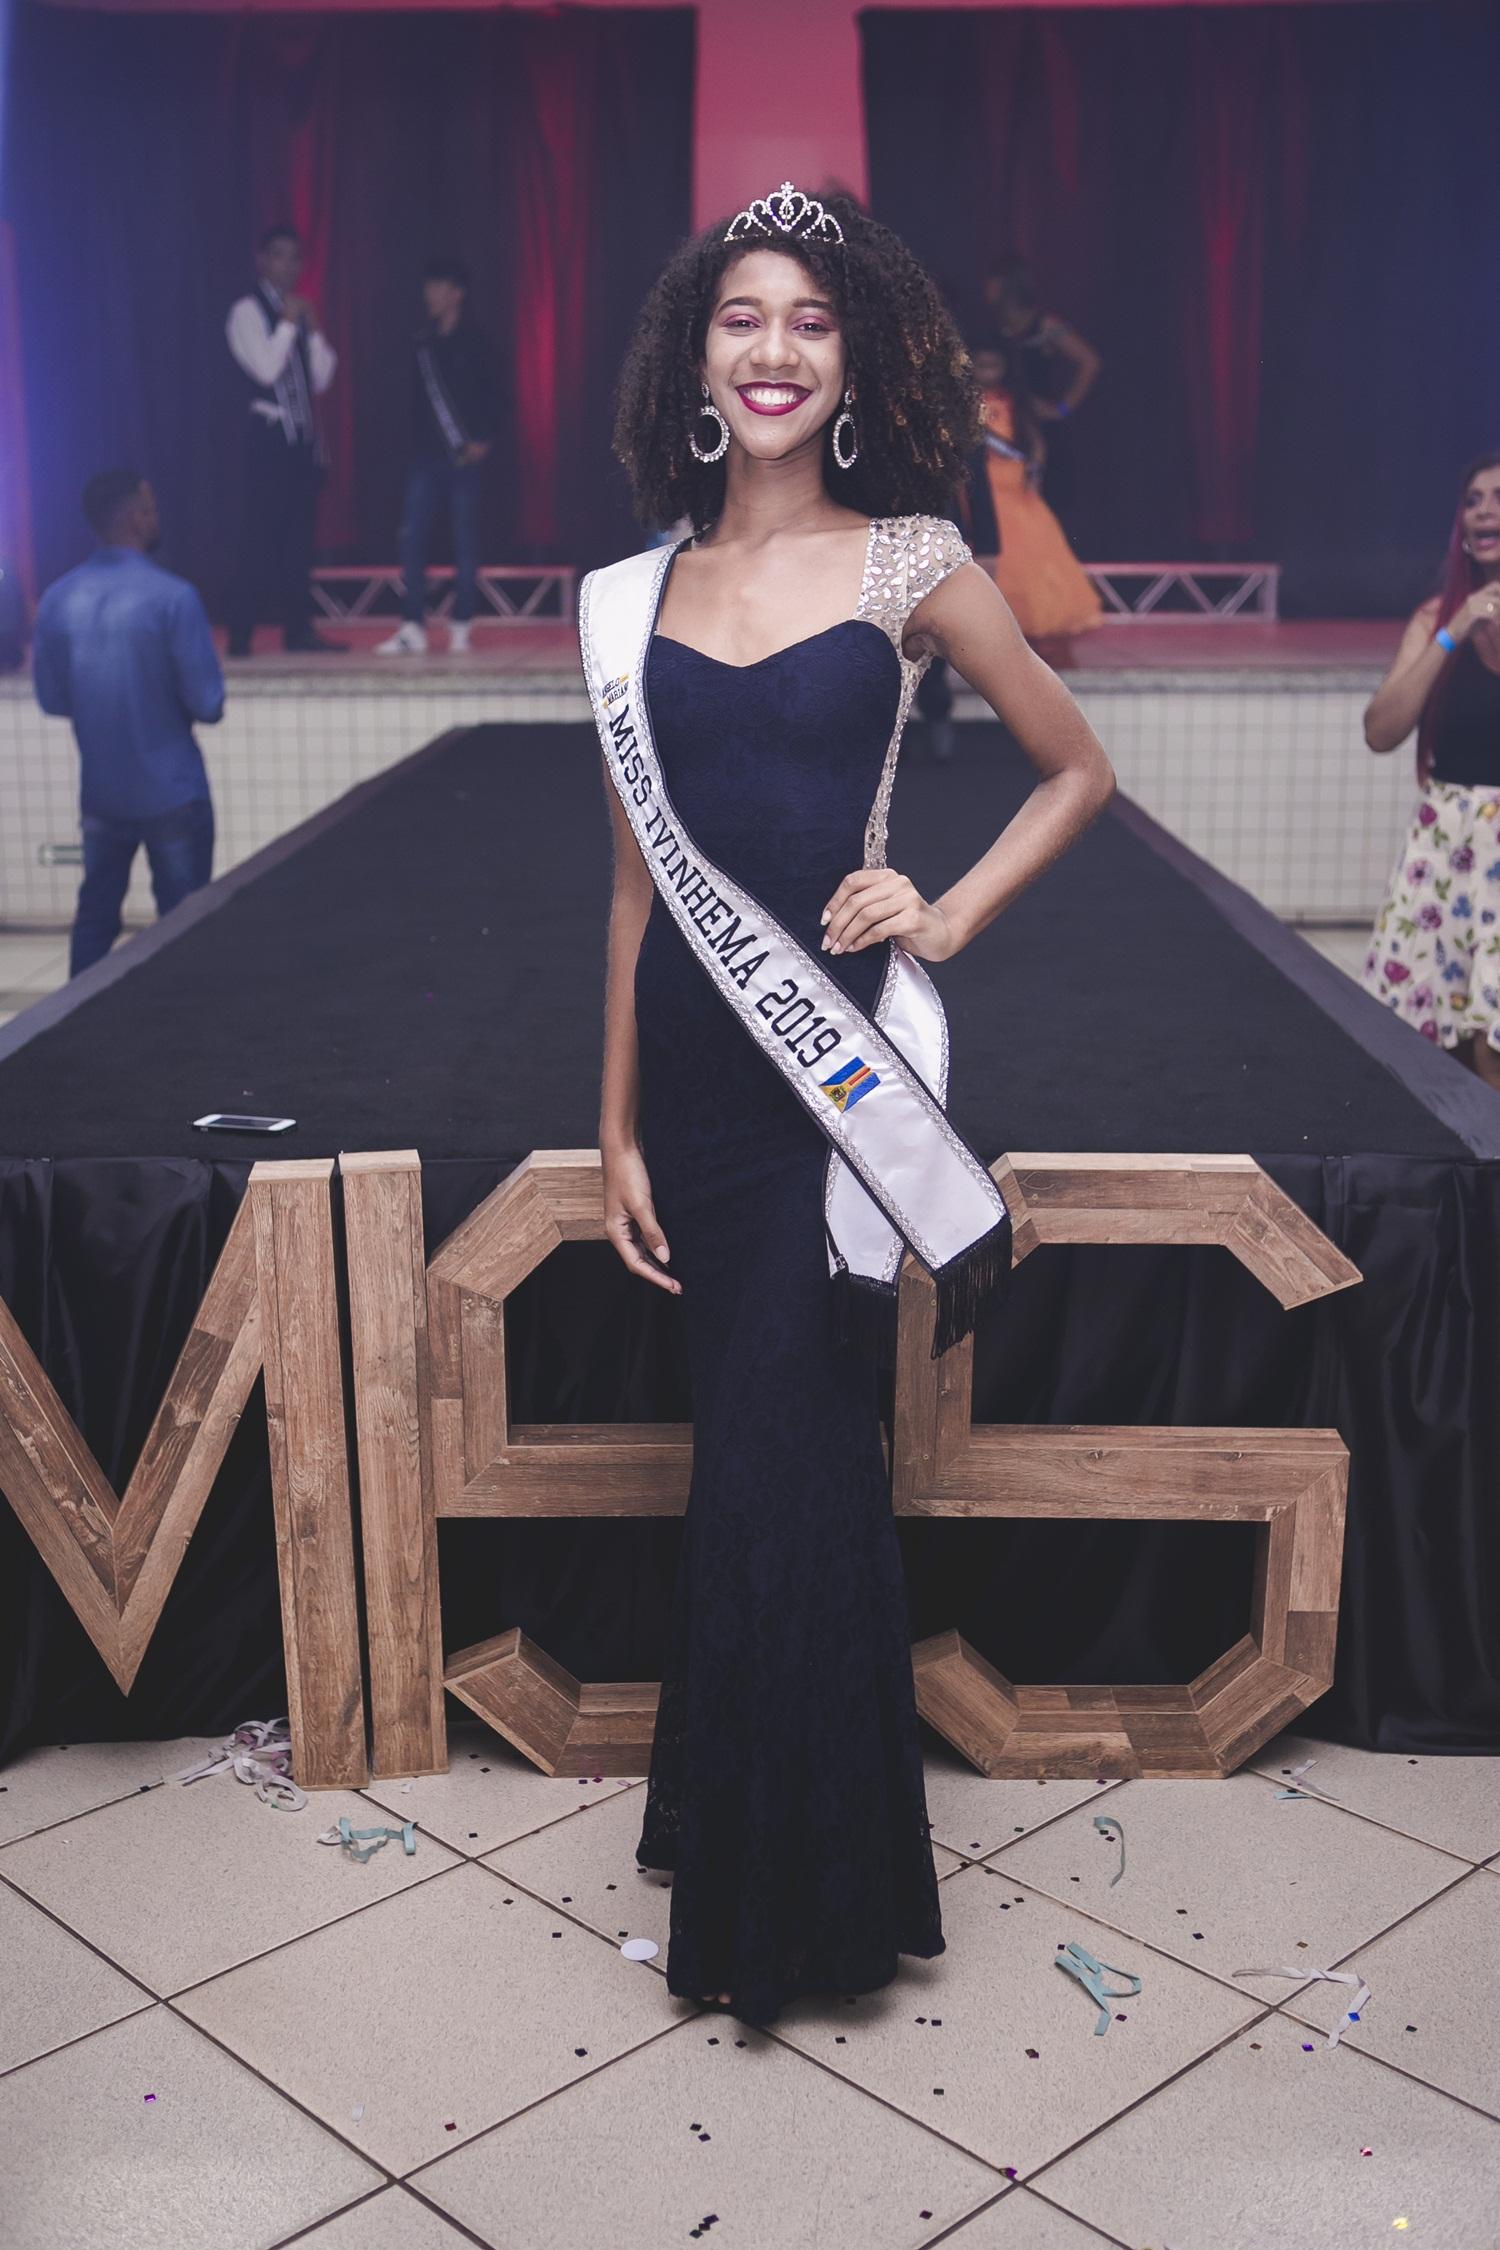 Miss 251